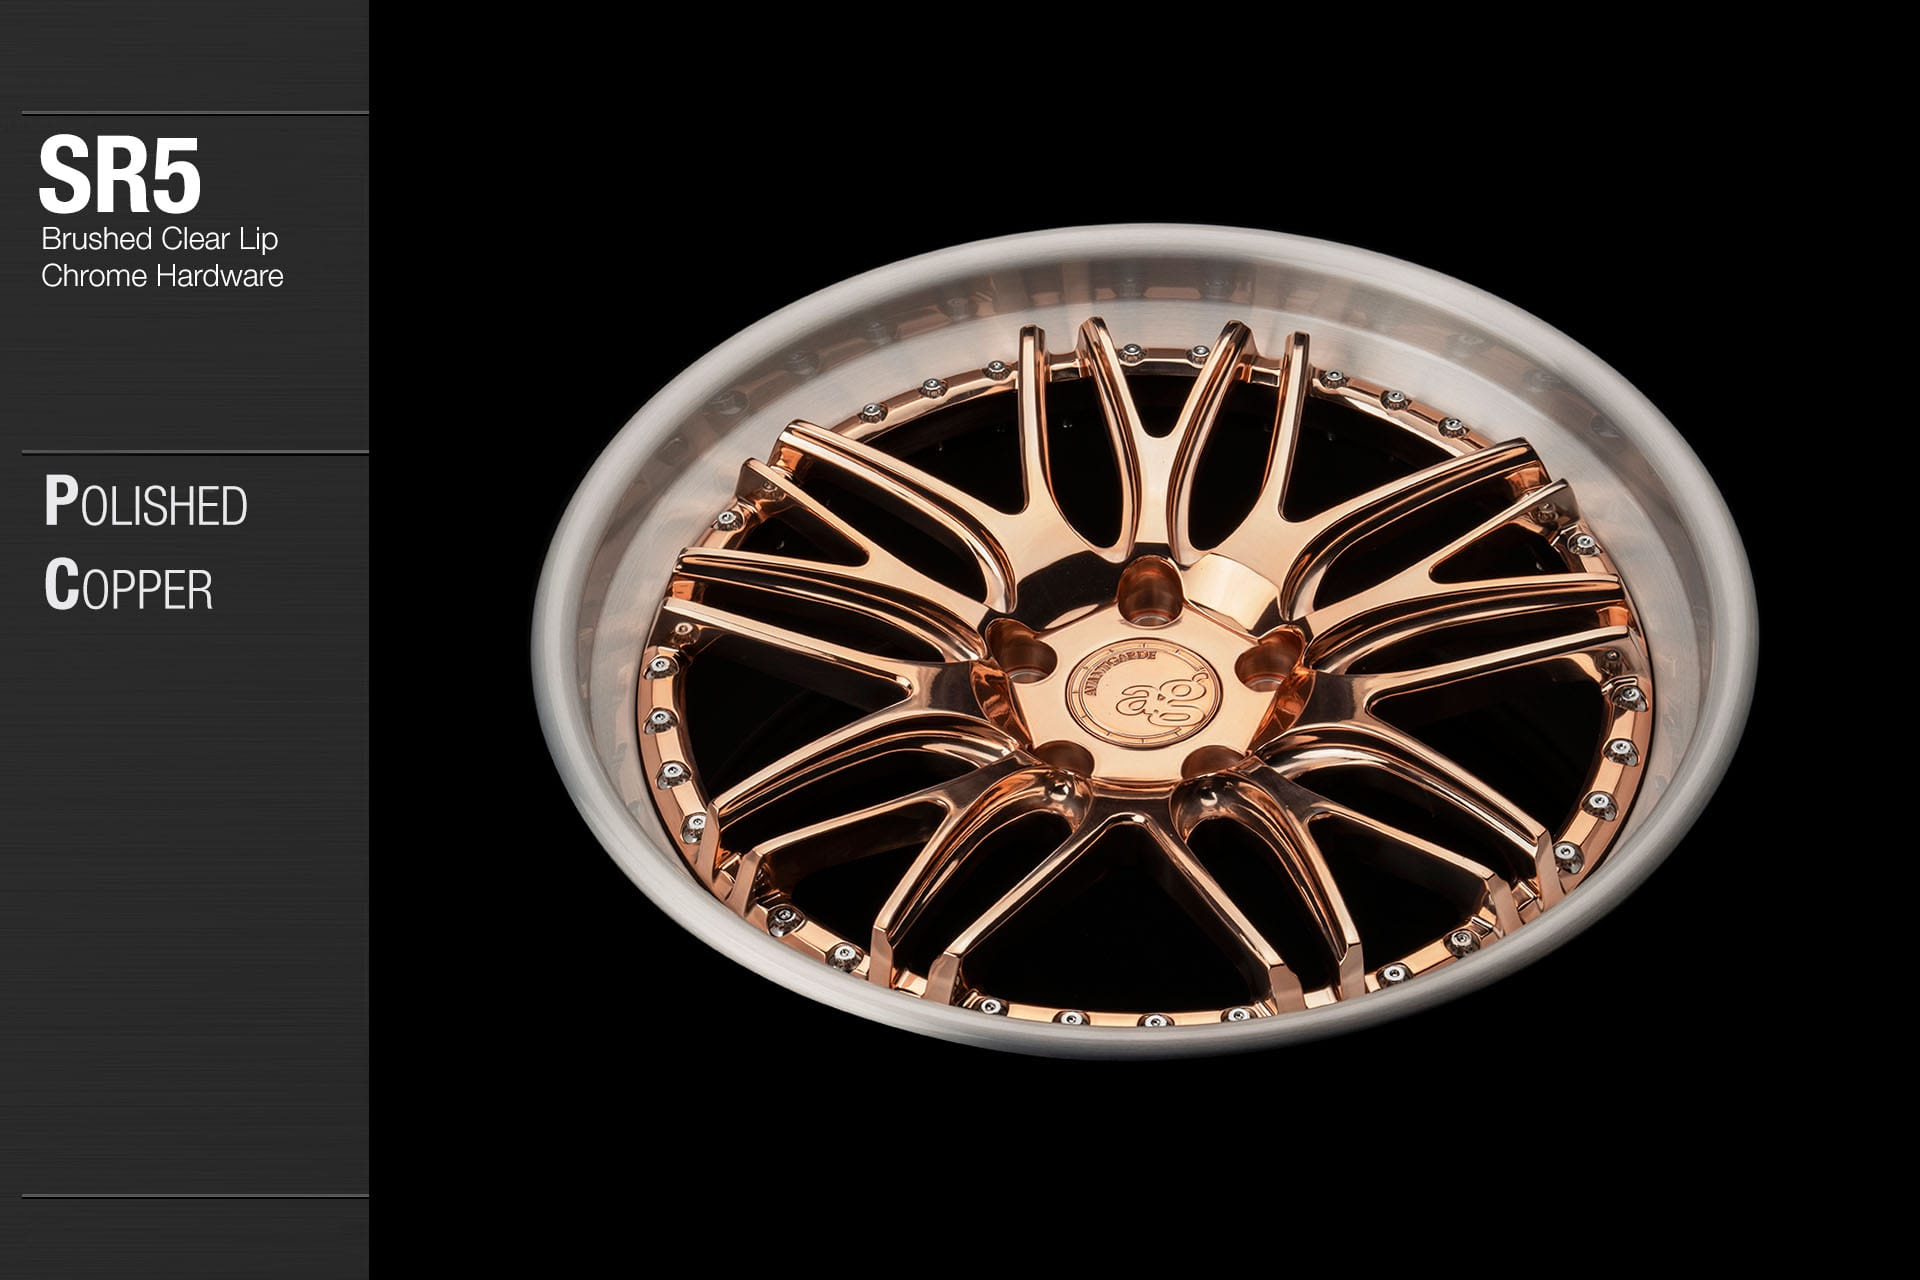 avant-garde-ag-wheels-sr5-polished-copper-face-brushed-clear-lip-chrome-hardware-3